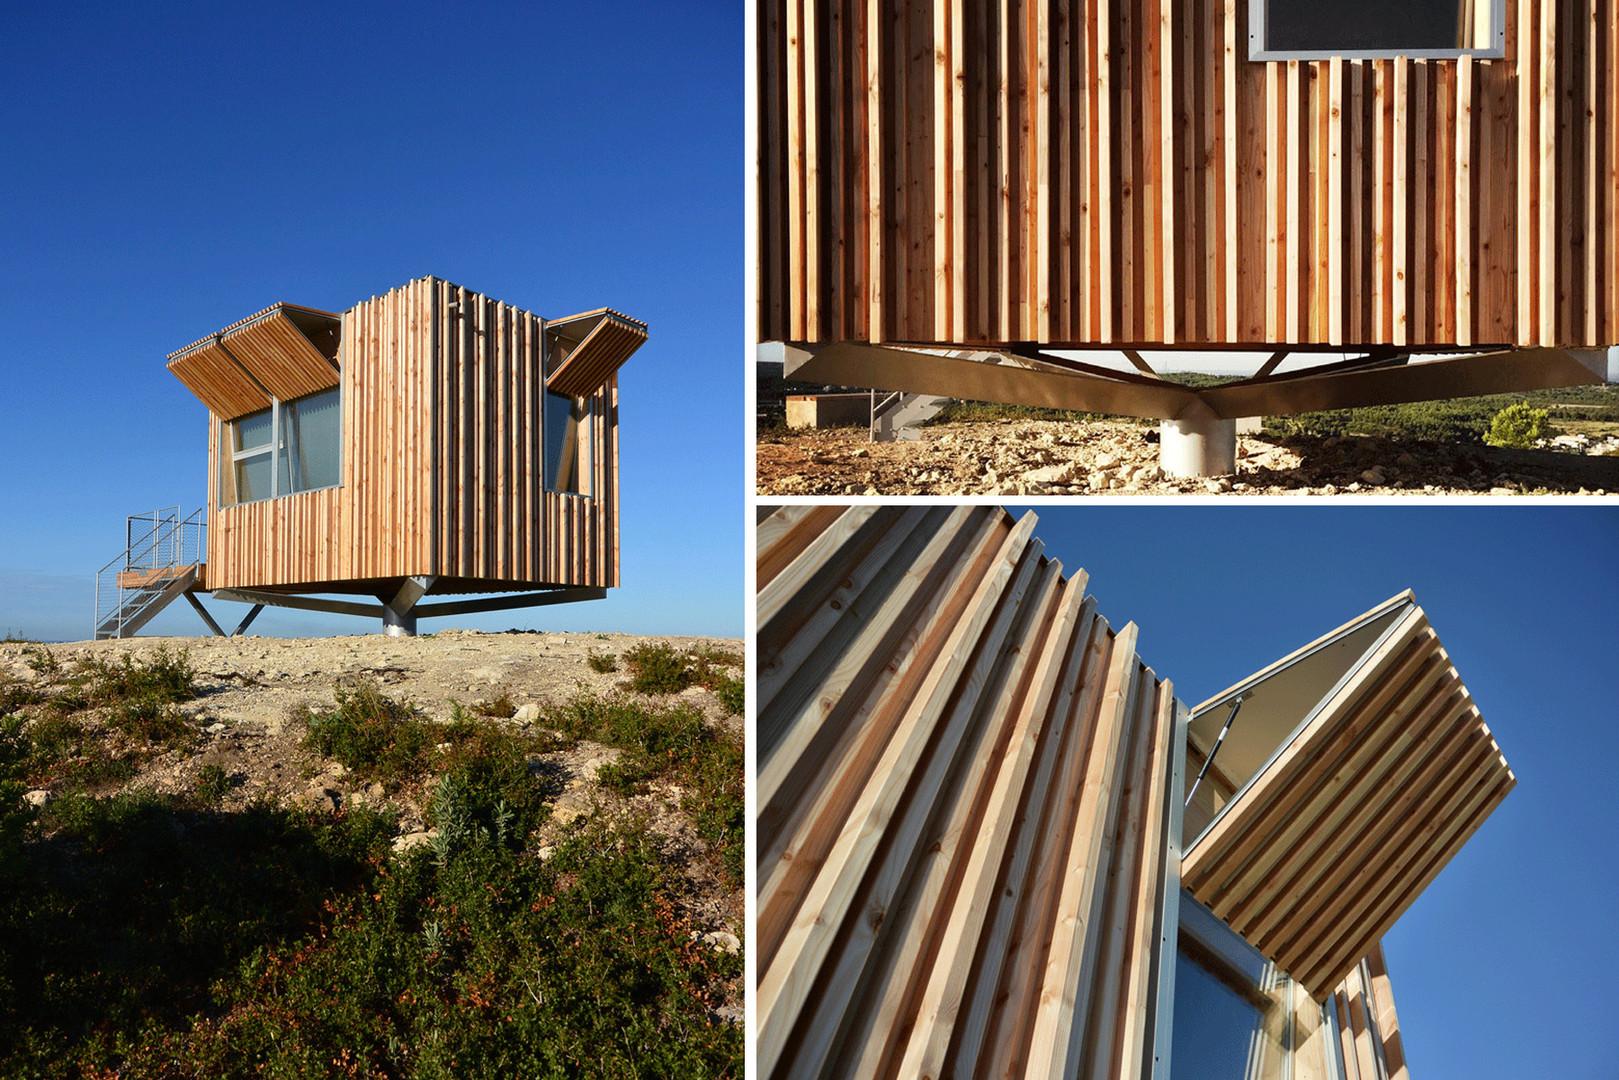 Frutoso-architecte-Vigie-Martigues3.jpg